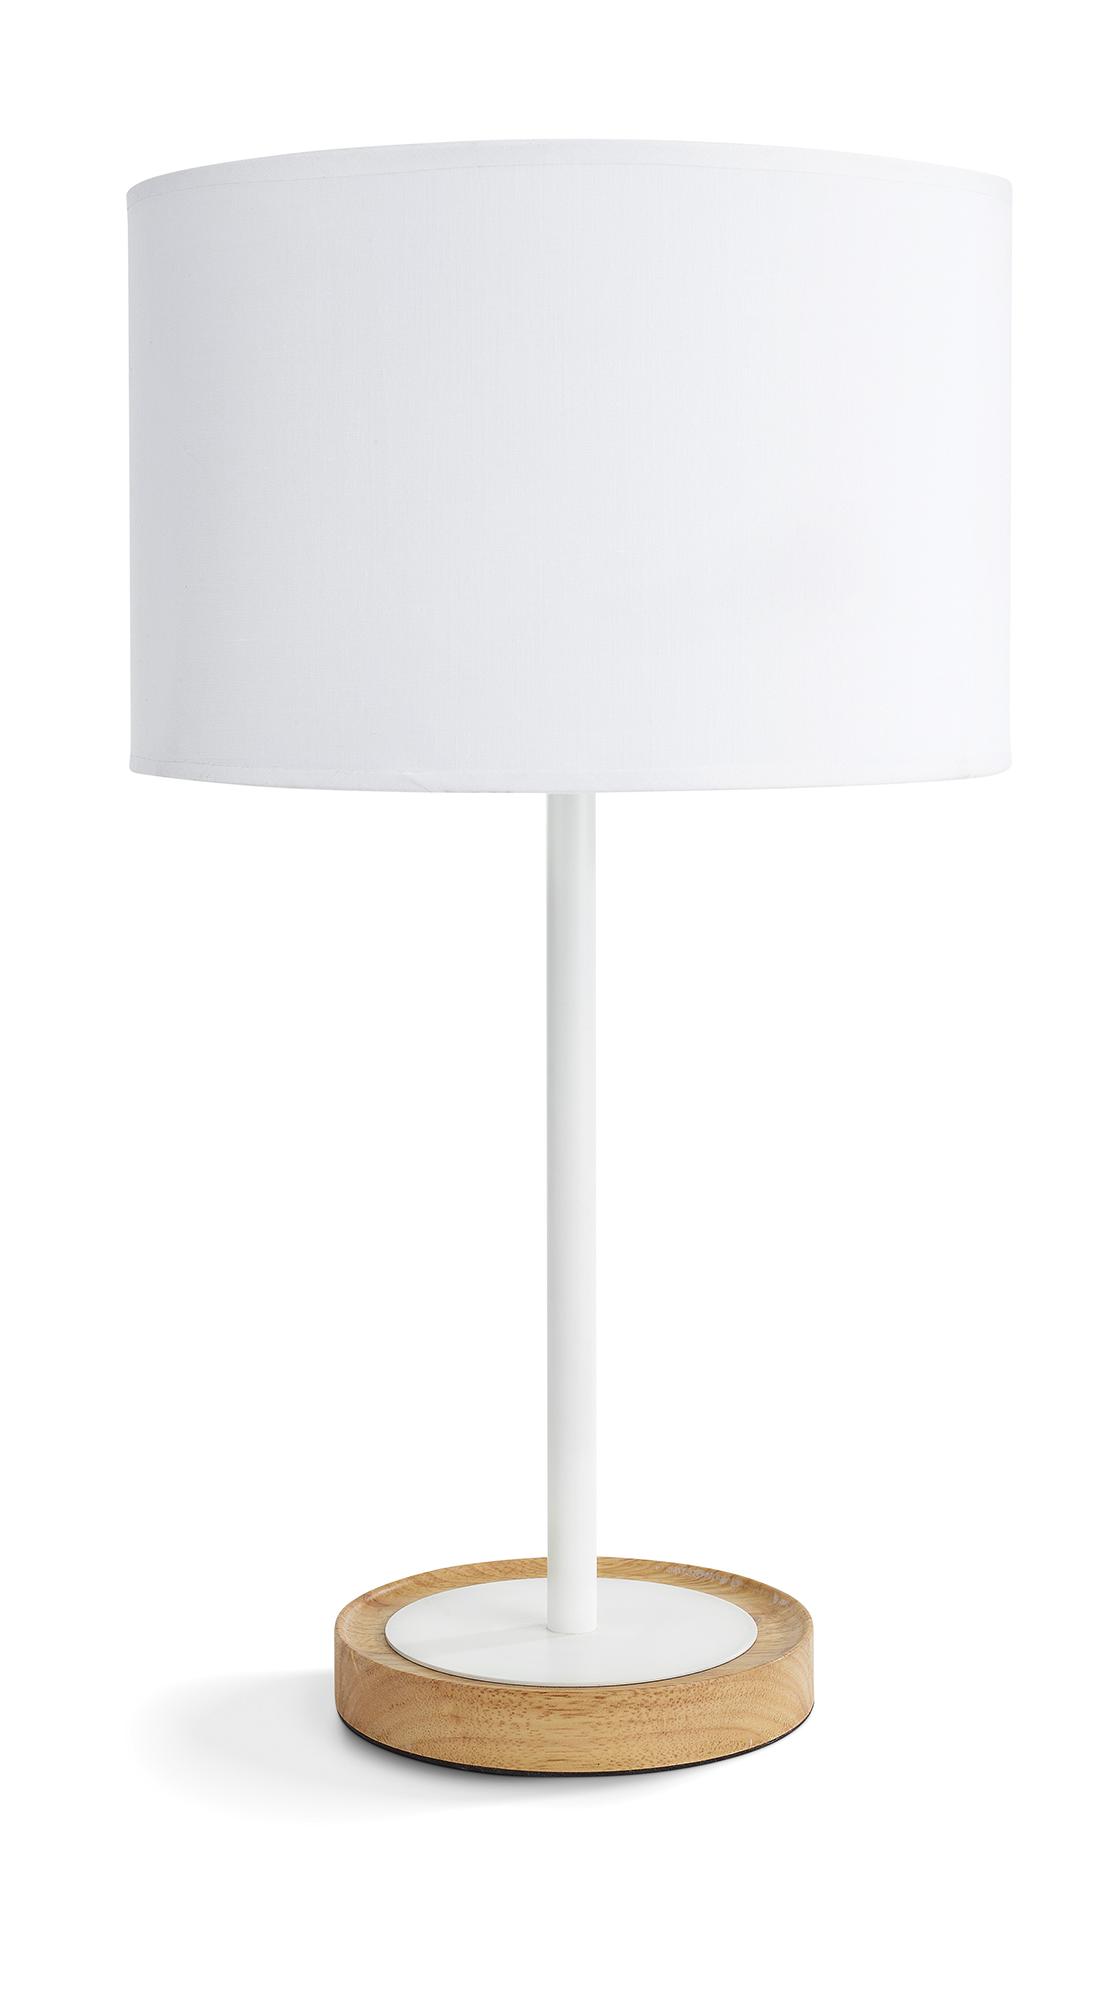 philips myliving limba tischleuchte creme beige 3601738e7 beleuchtung. Black Bedroom Furniture Sets. Home Design Ideas